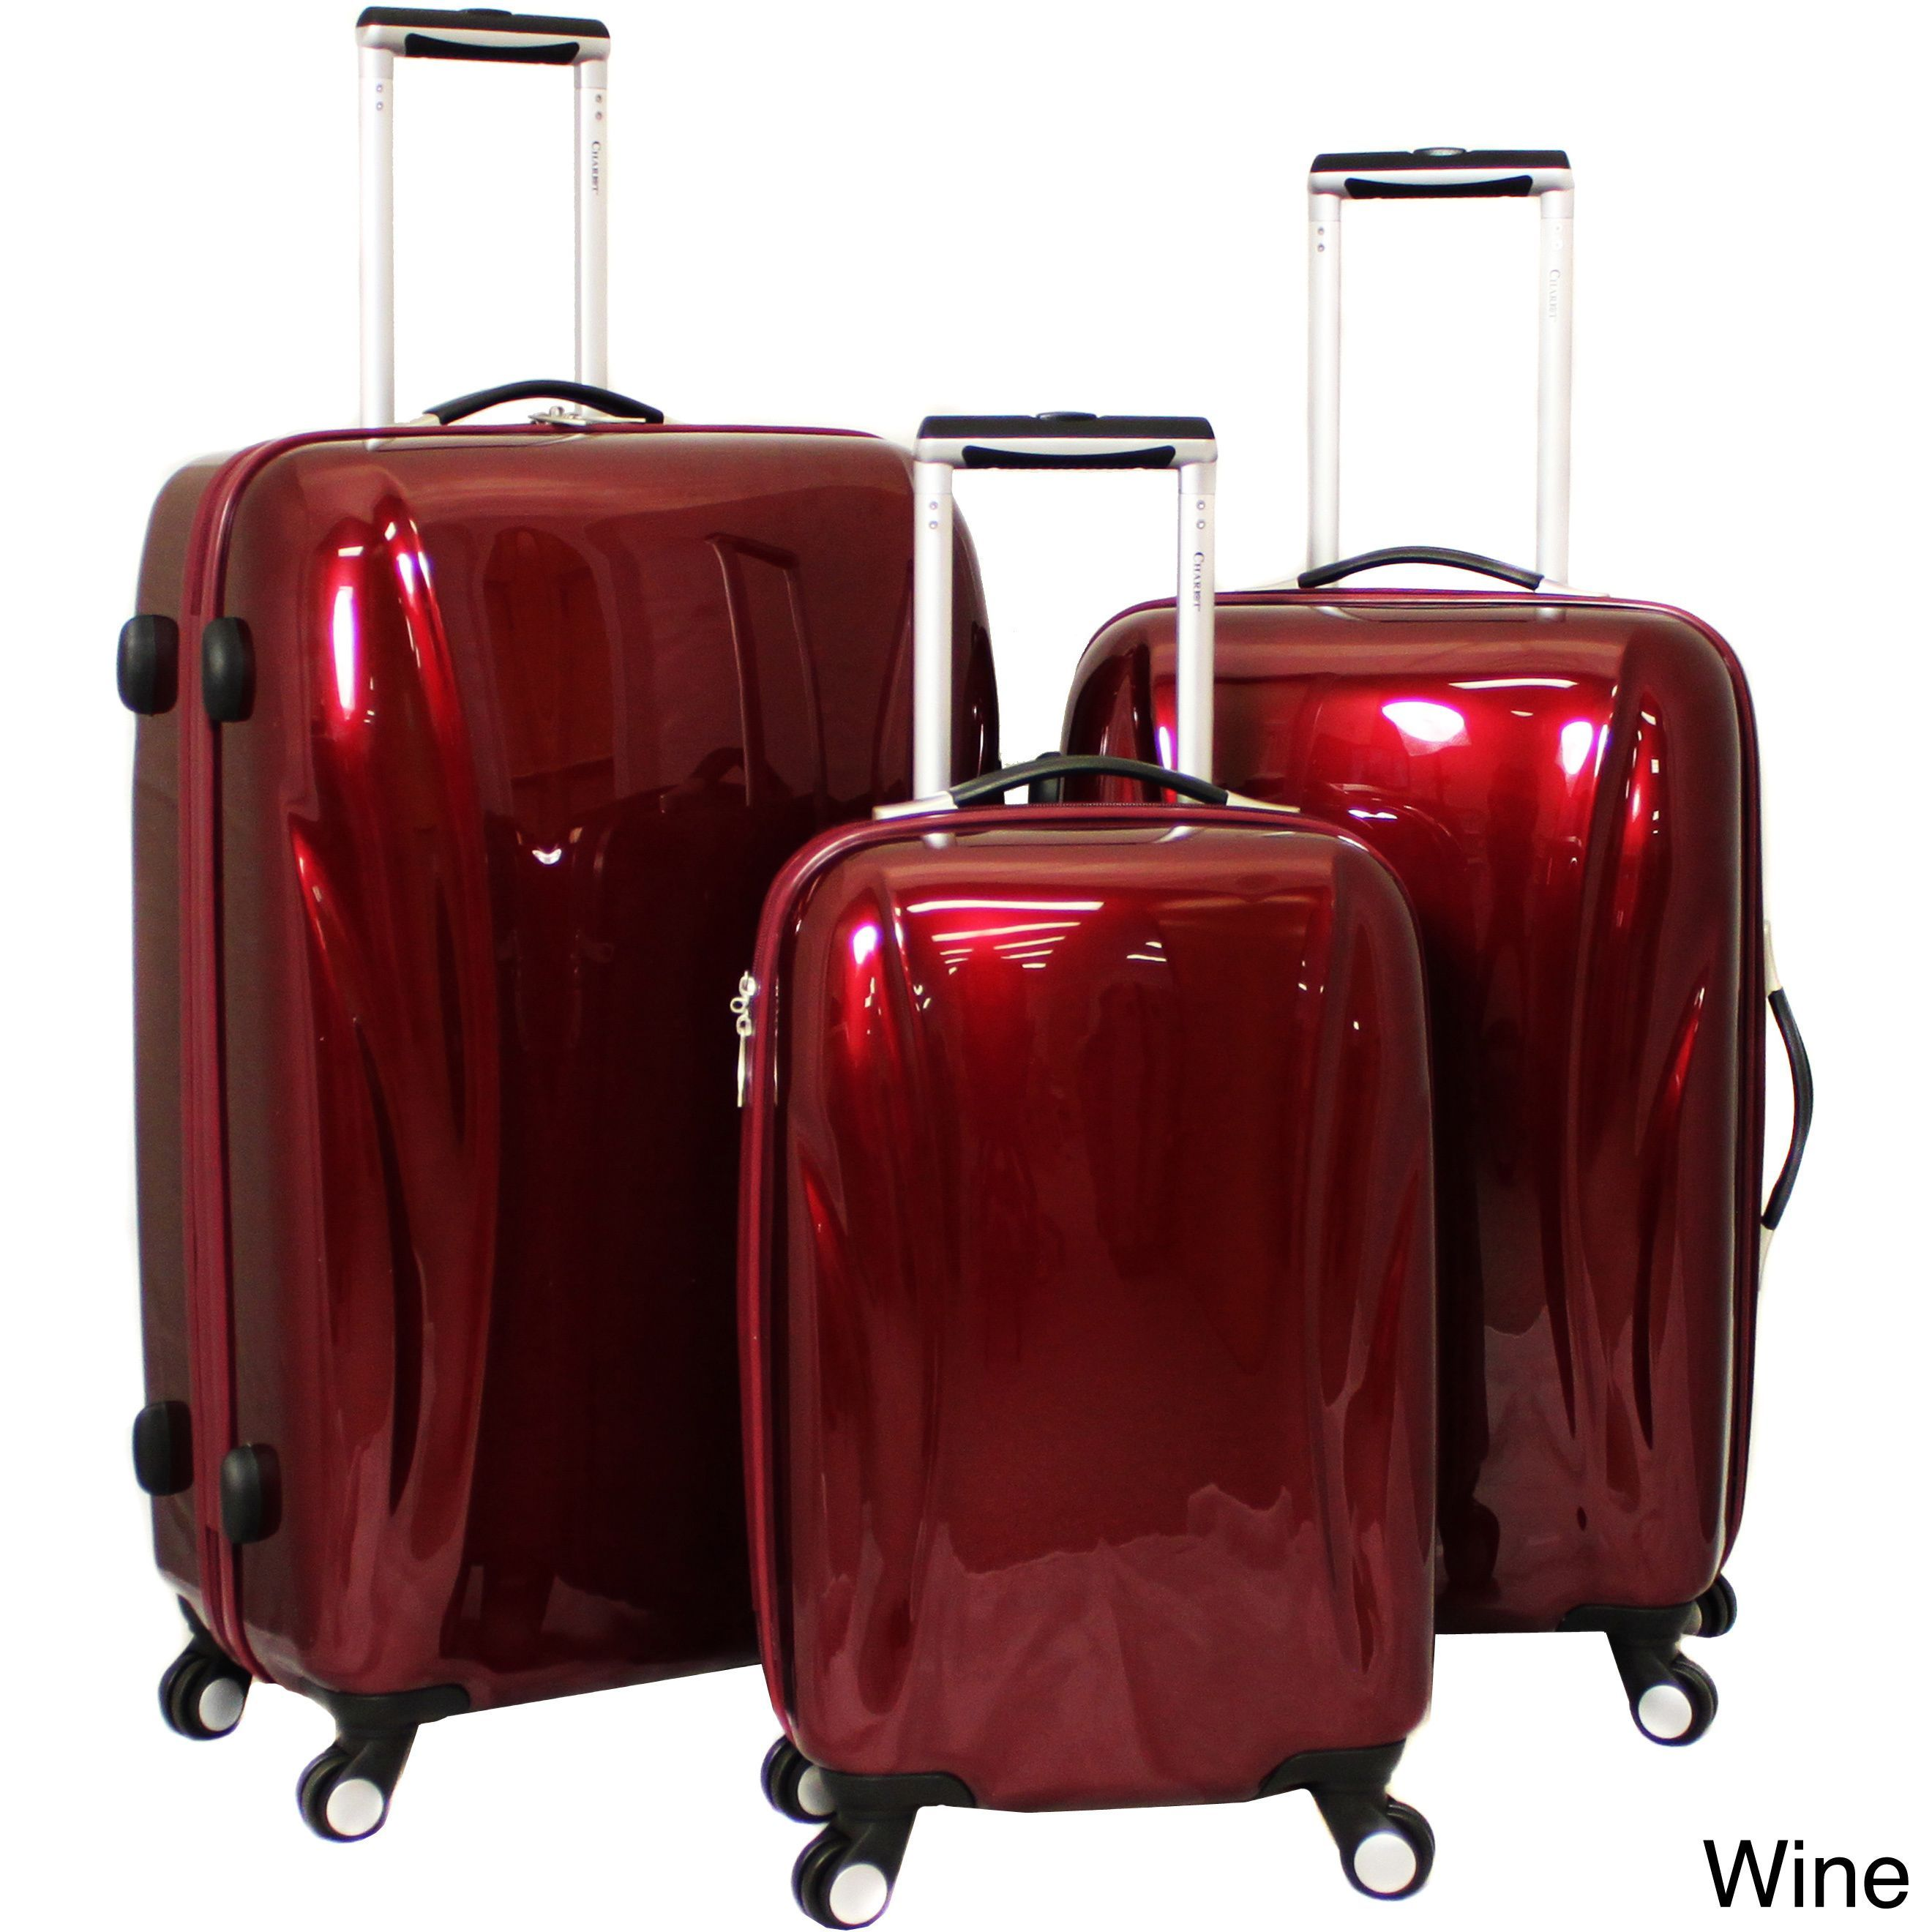 Overstock Com Online Shopping Bedding Furniture Electronics Jewelry Clothing More Luggage Hardside Luggage Luggage Sets